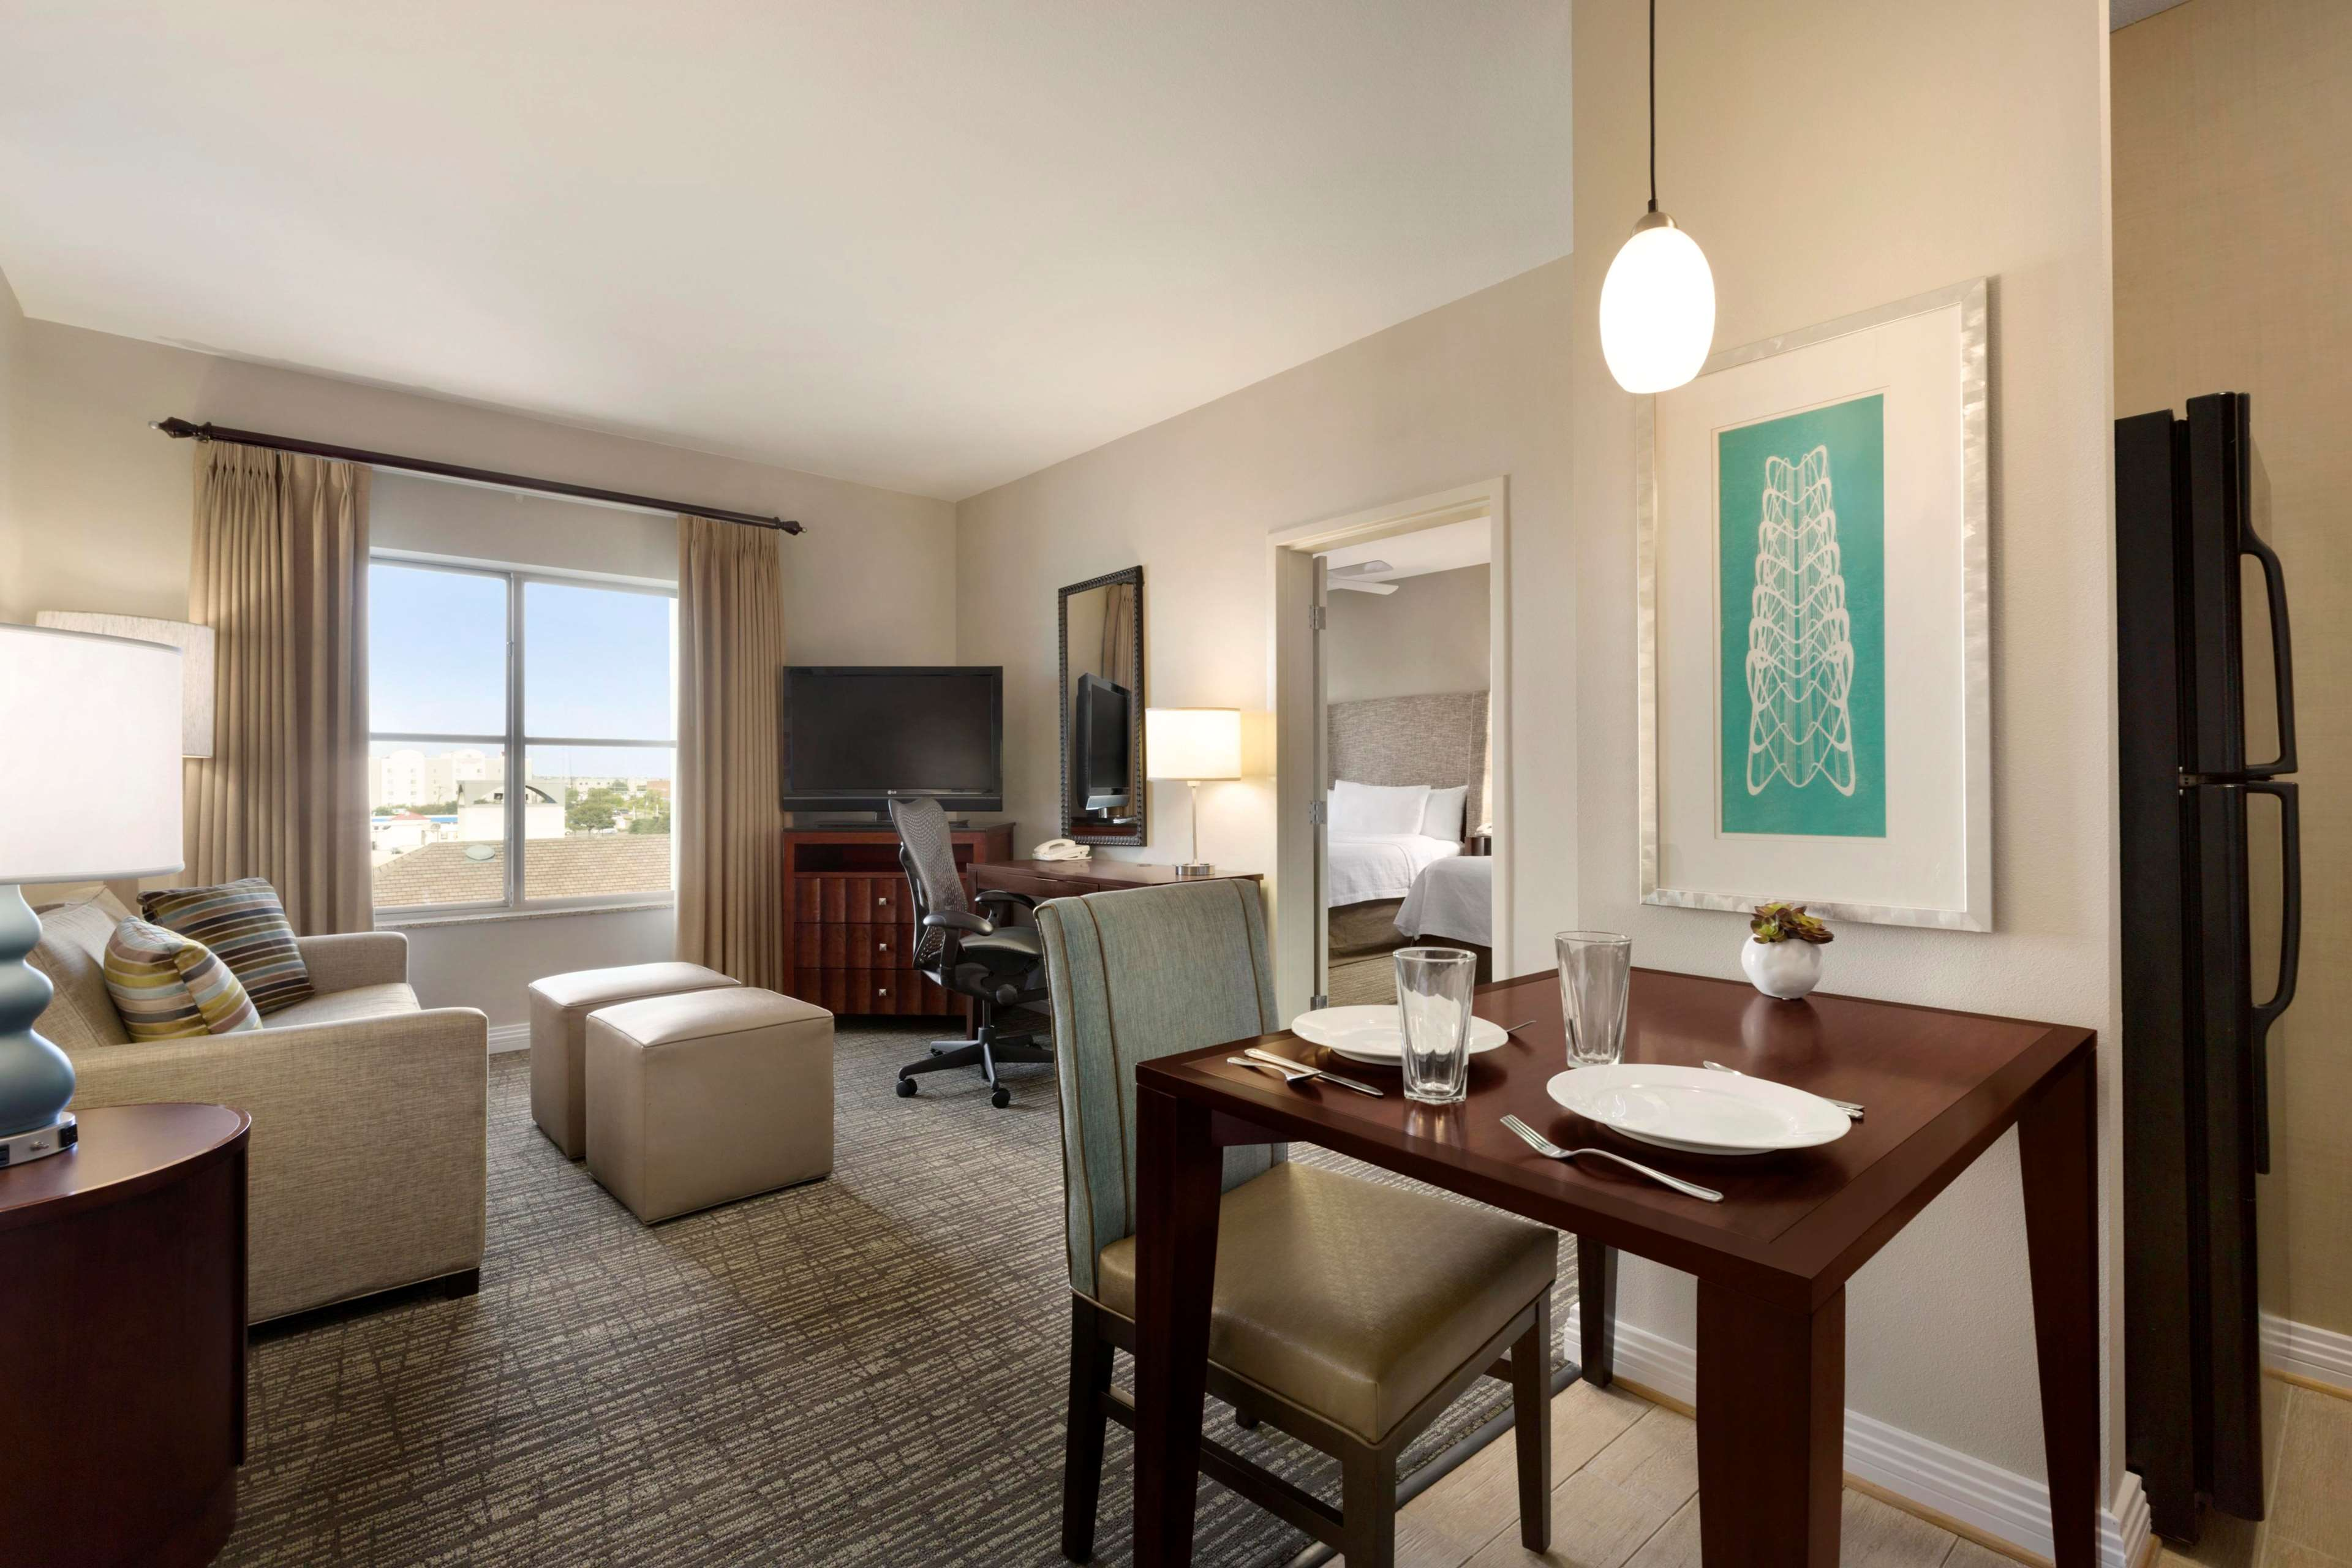 Homewood Suites by Hilton Plano-Richardson image 16